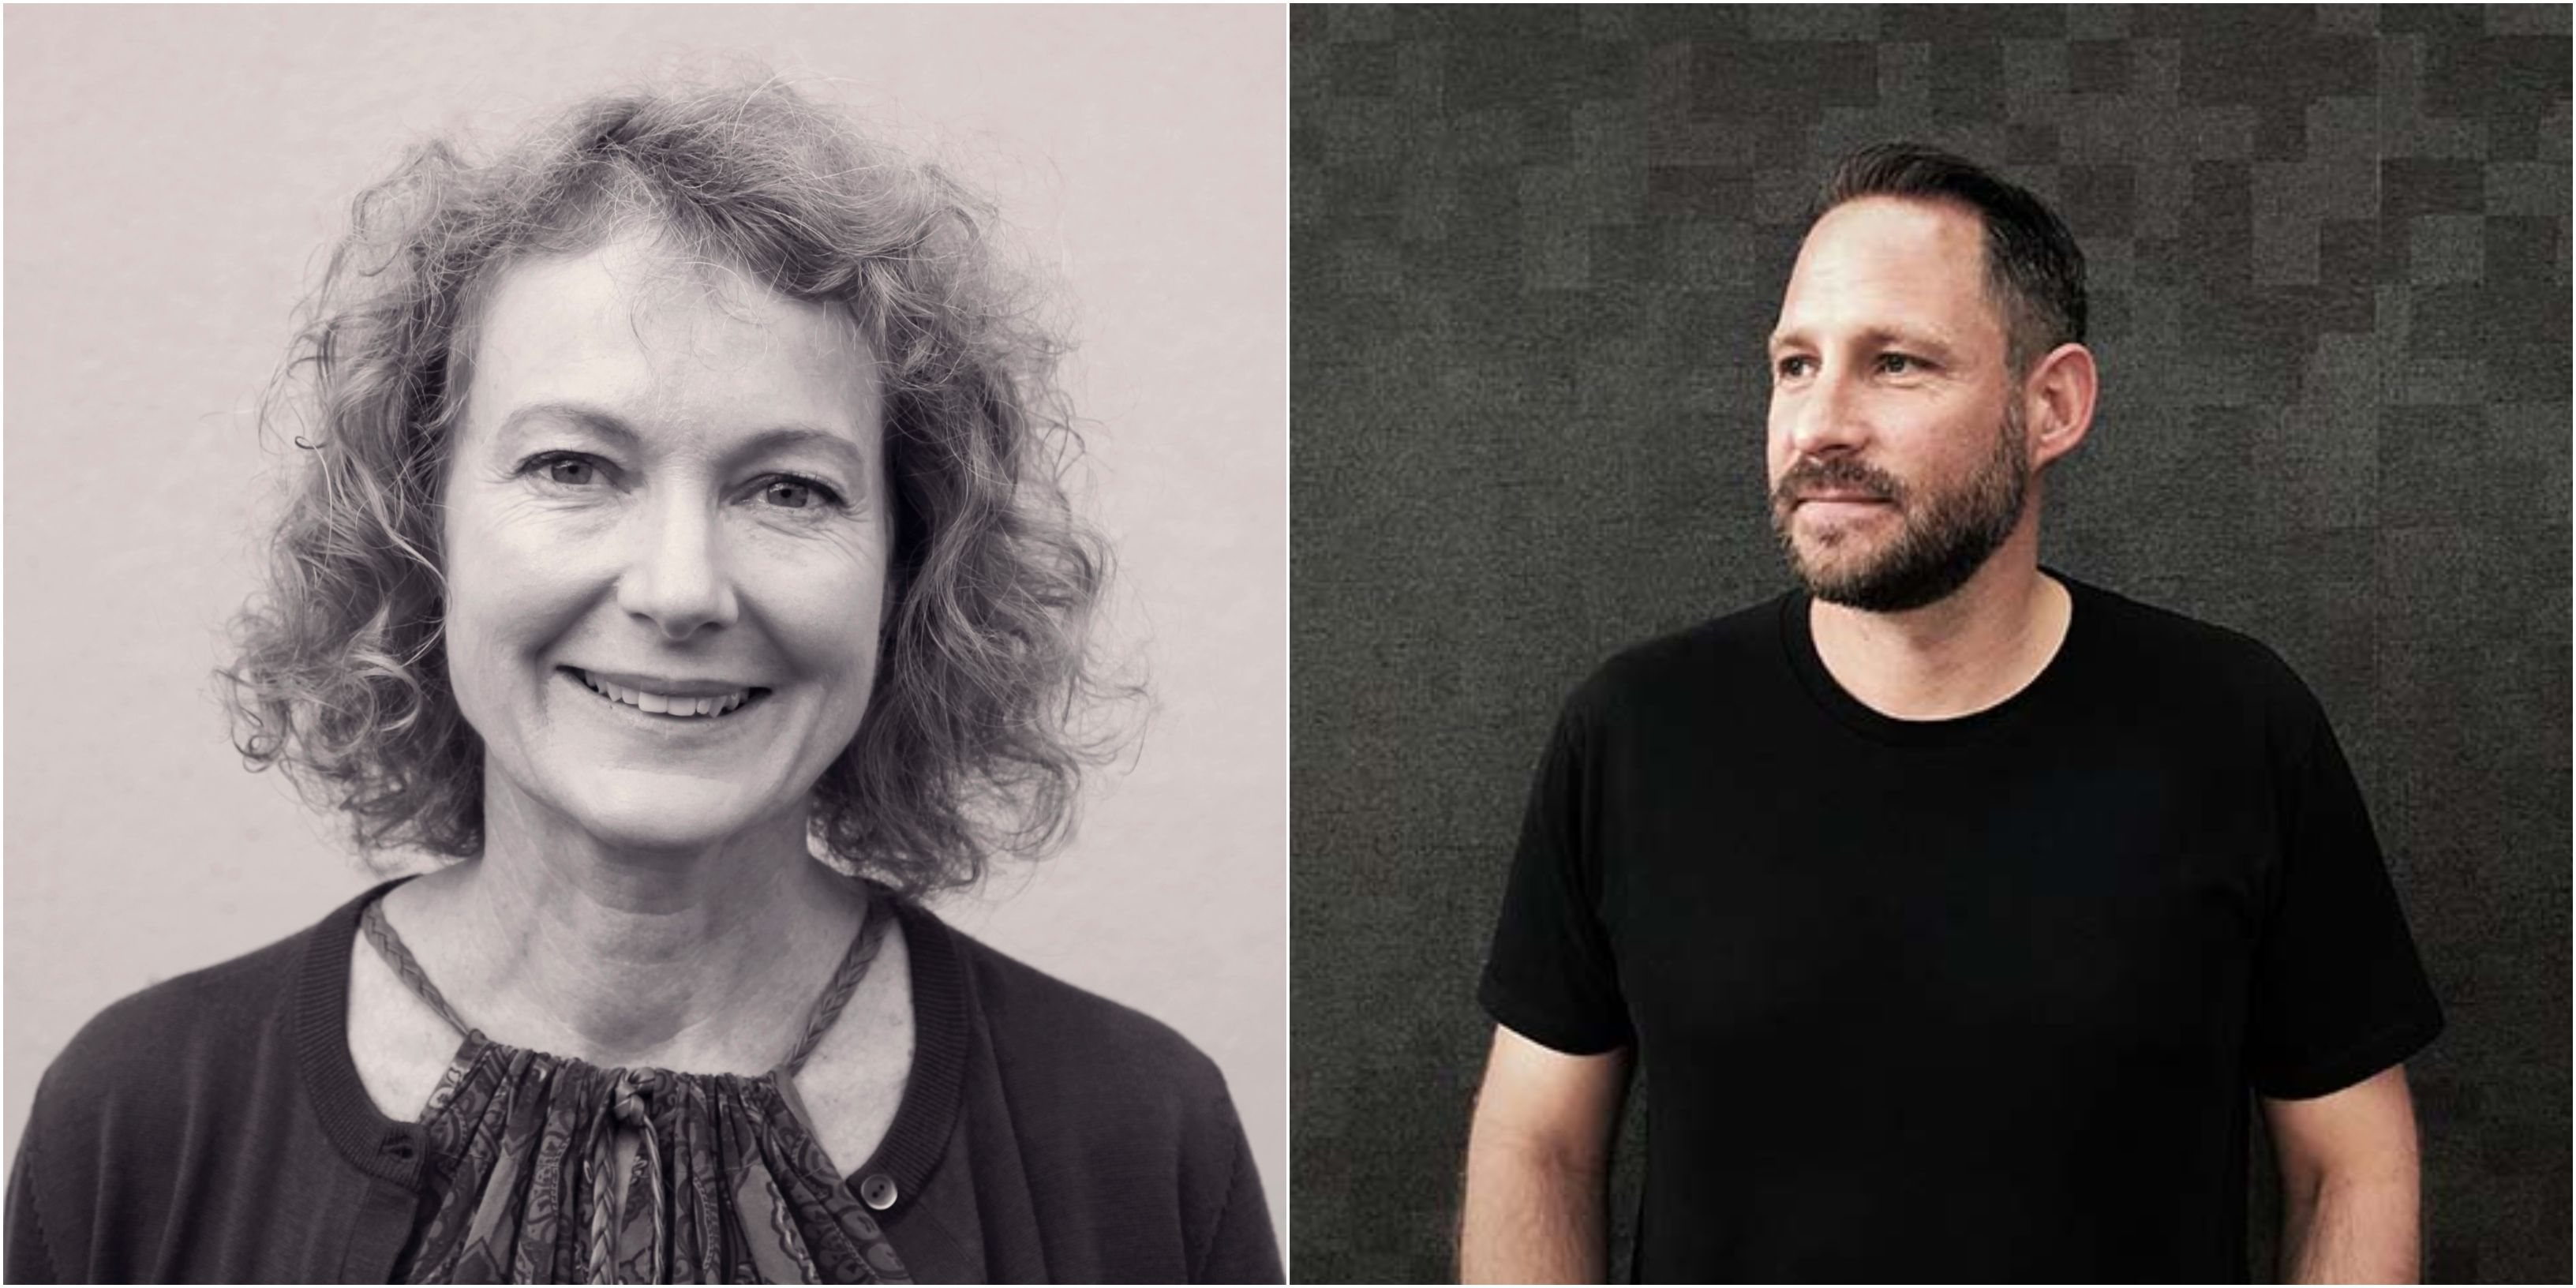 VMLY&R ECD Kim Pick and DDB ECD Gary Steele to represent New Zealand on Ad Stars 2019 juries